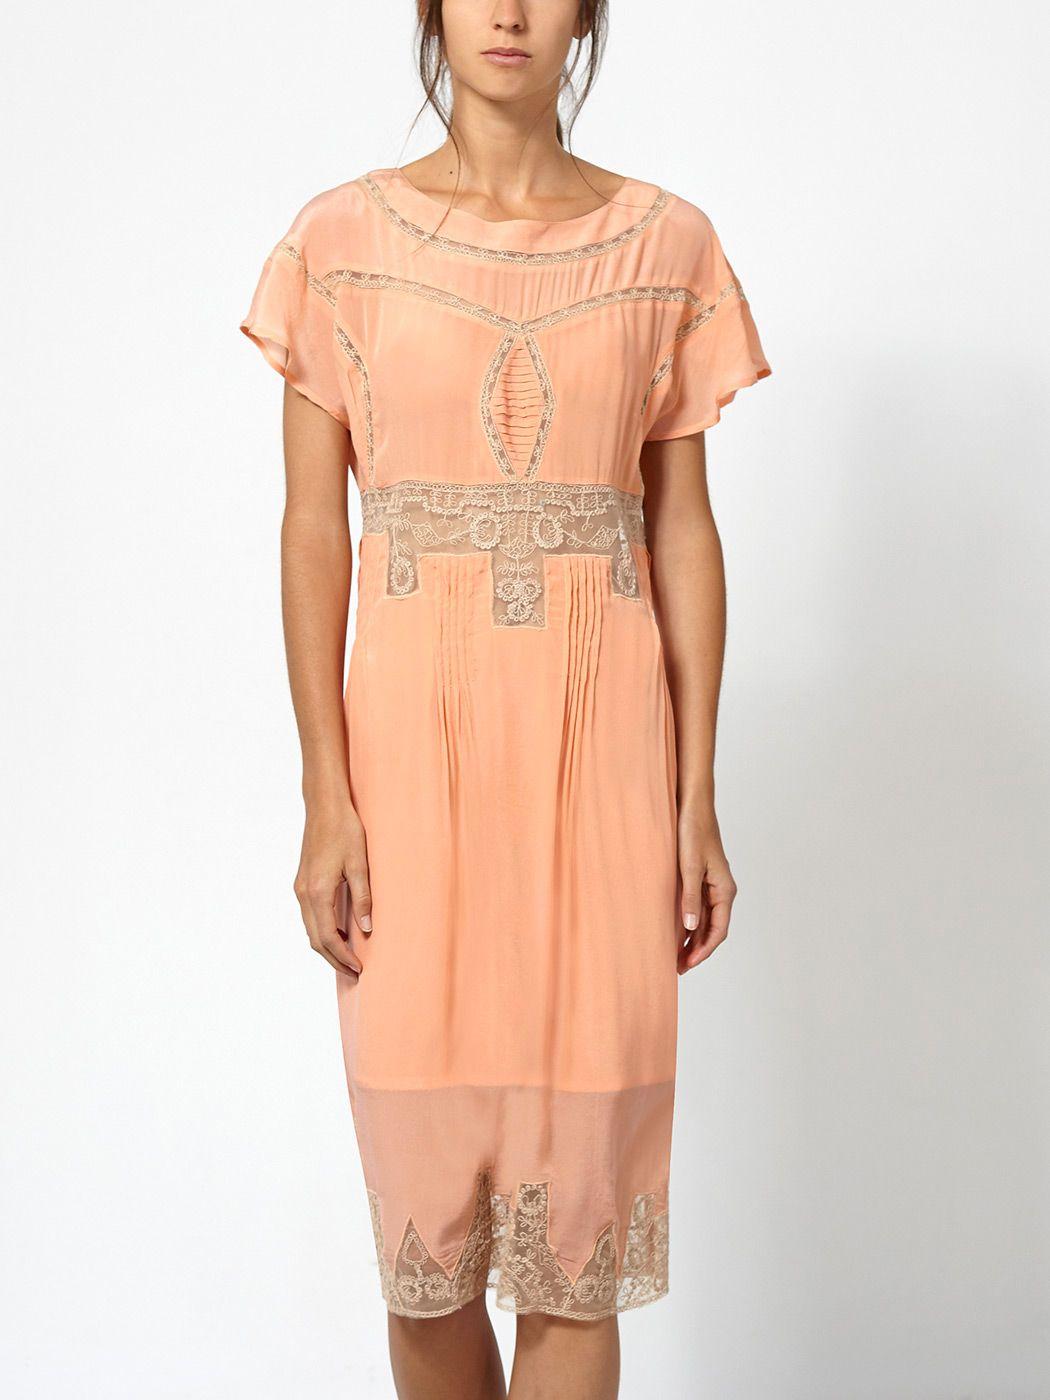 Hoss intropia yellow lace dress